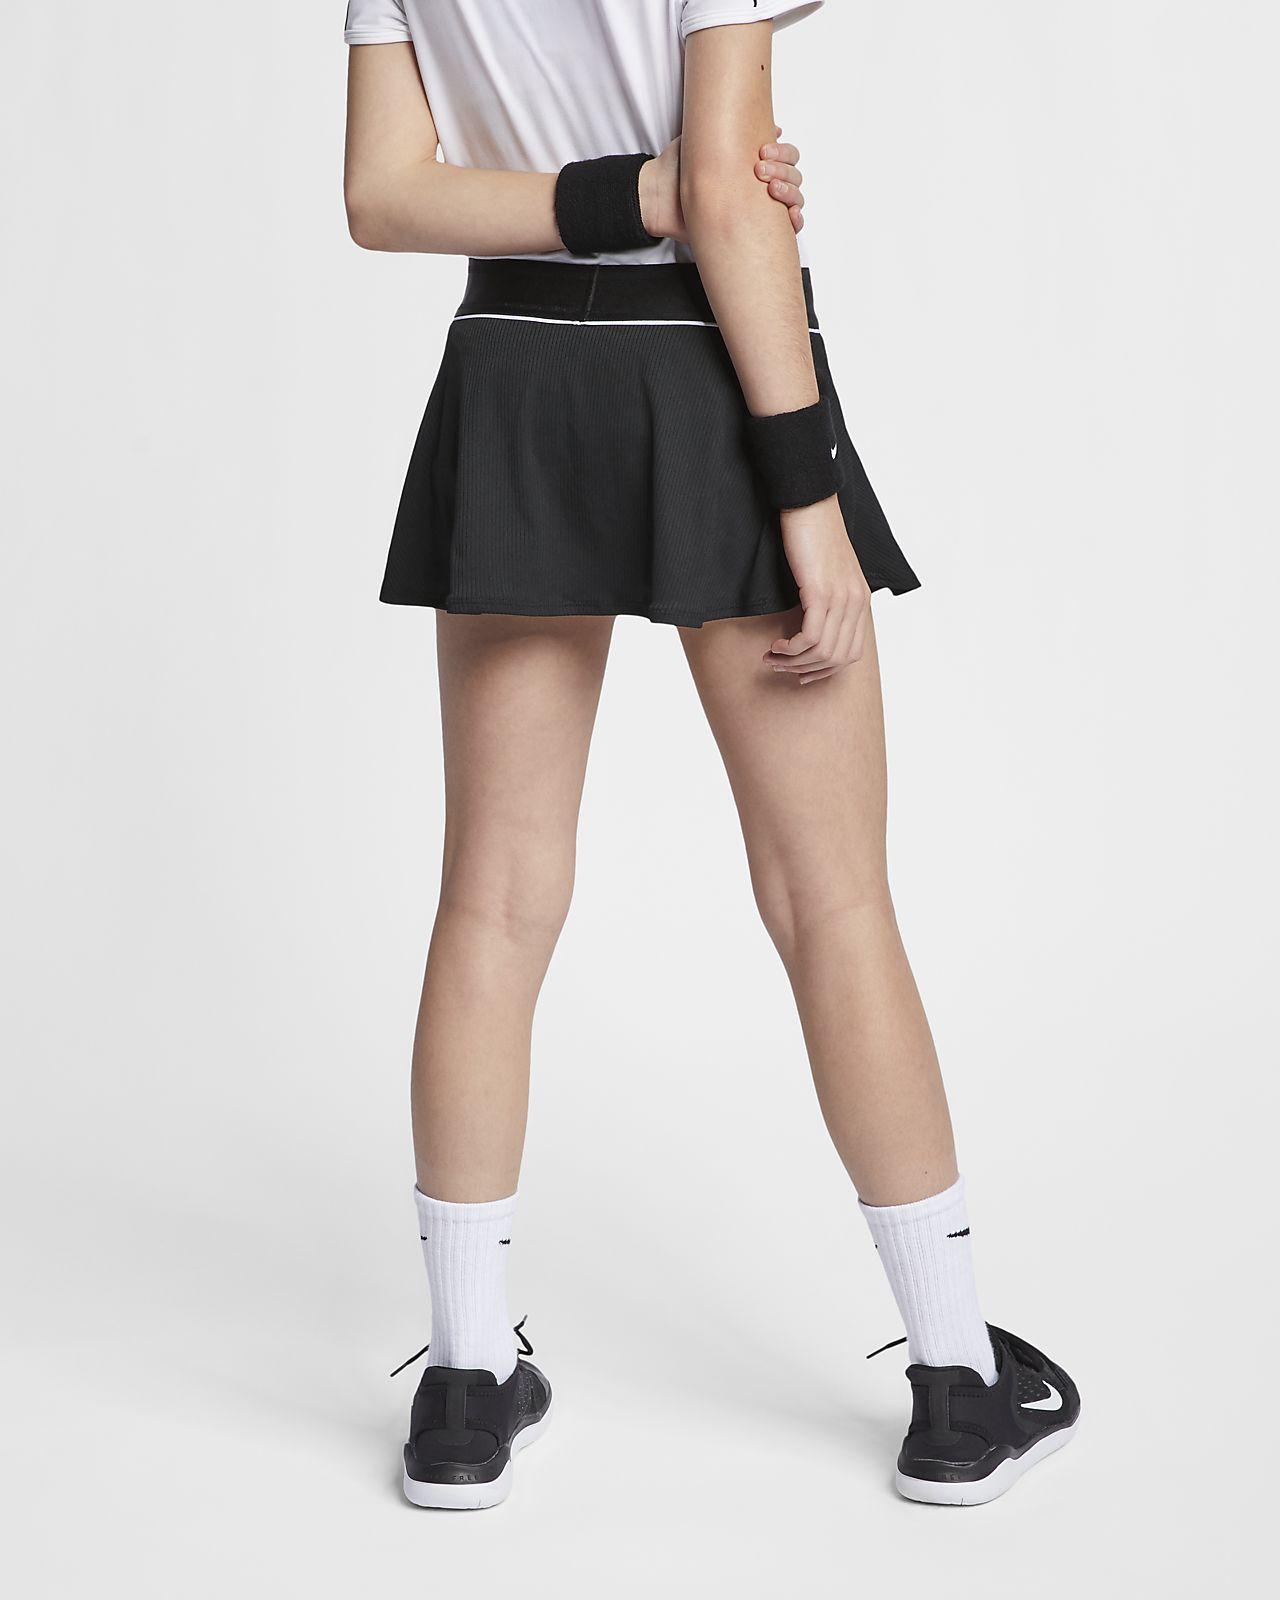 c55d6338cf NikeCourt Big Kids' (Girls') Tennis Skirt. Nike.com